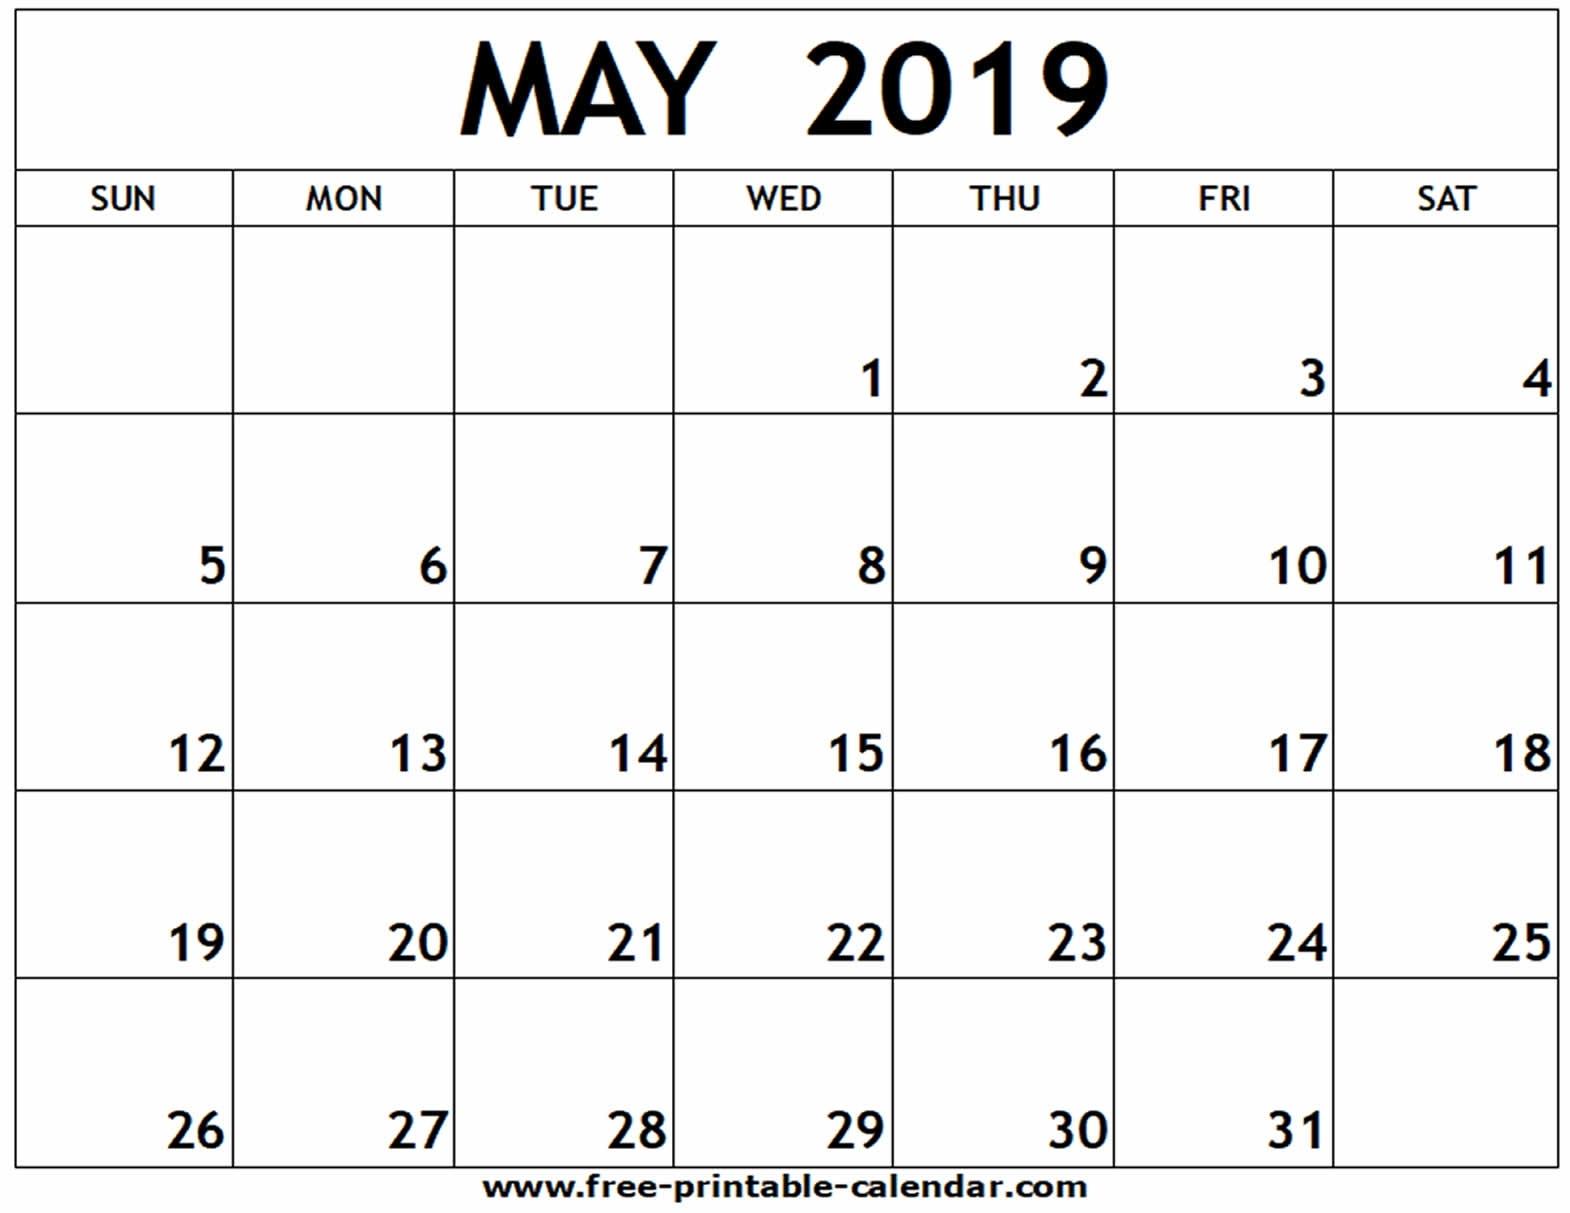 May 2019 Printable Calendar - Free-Printable-Calendar